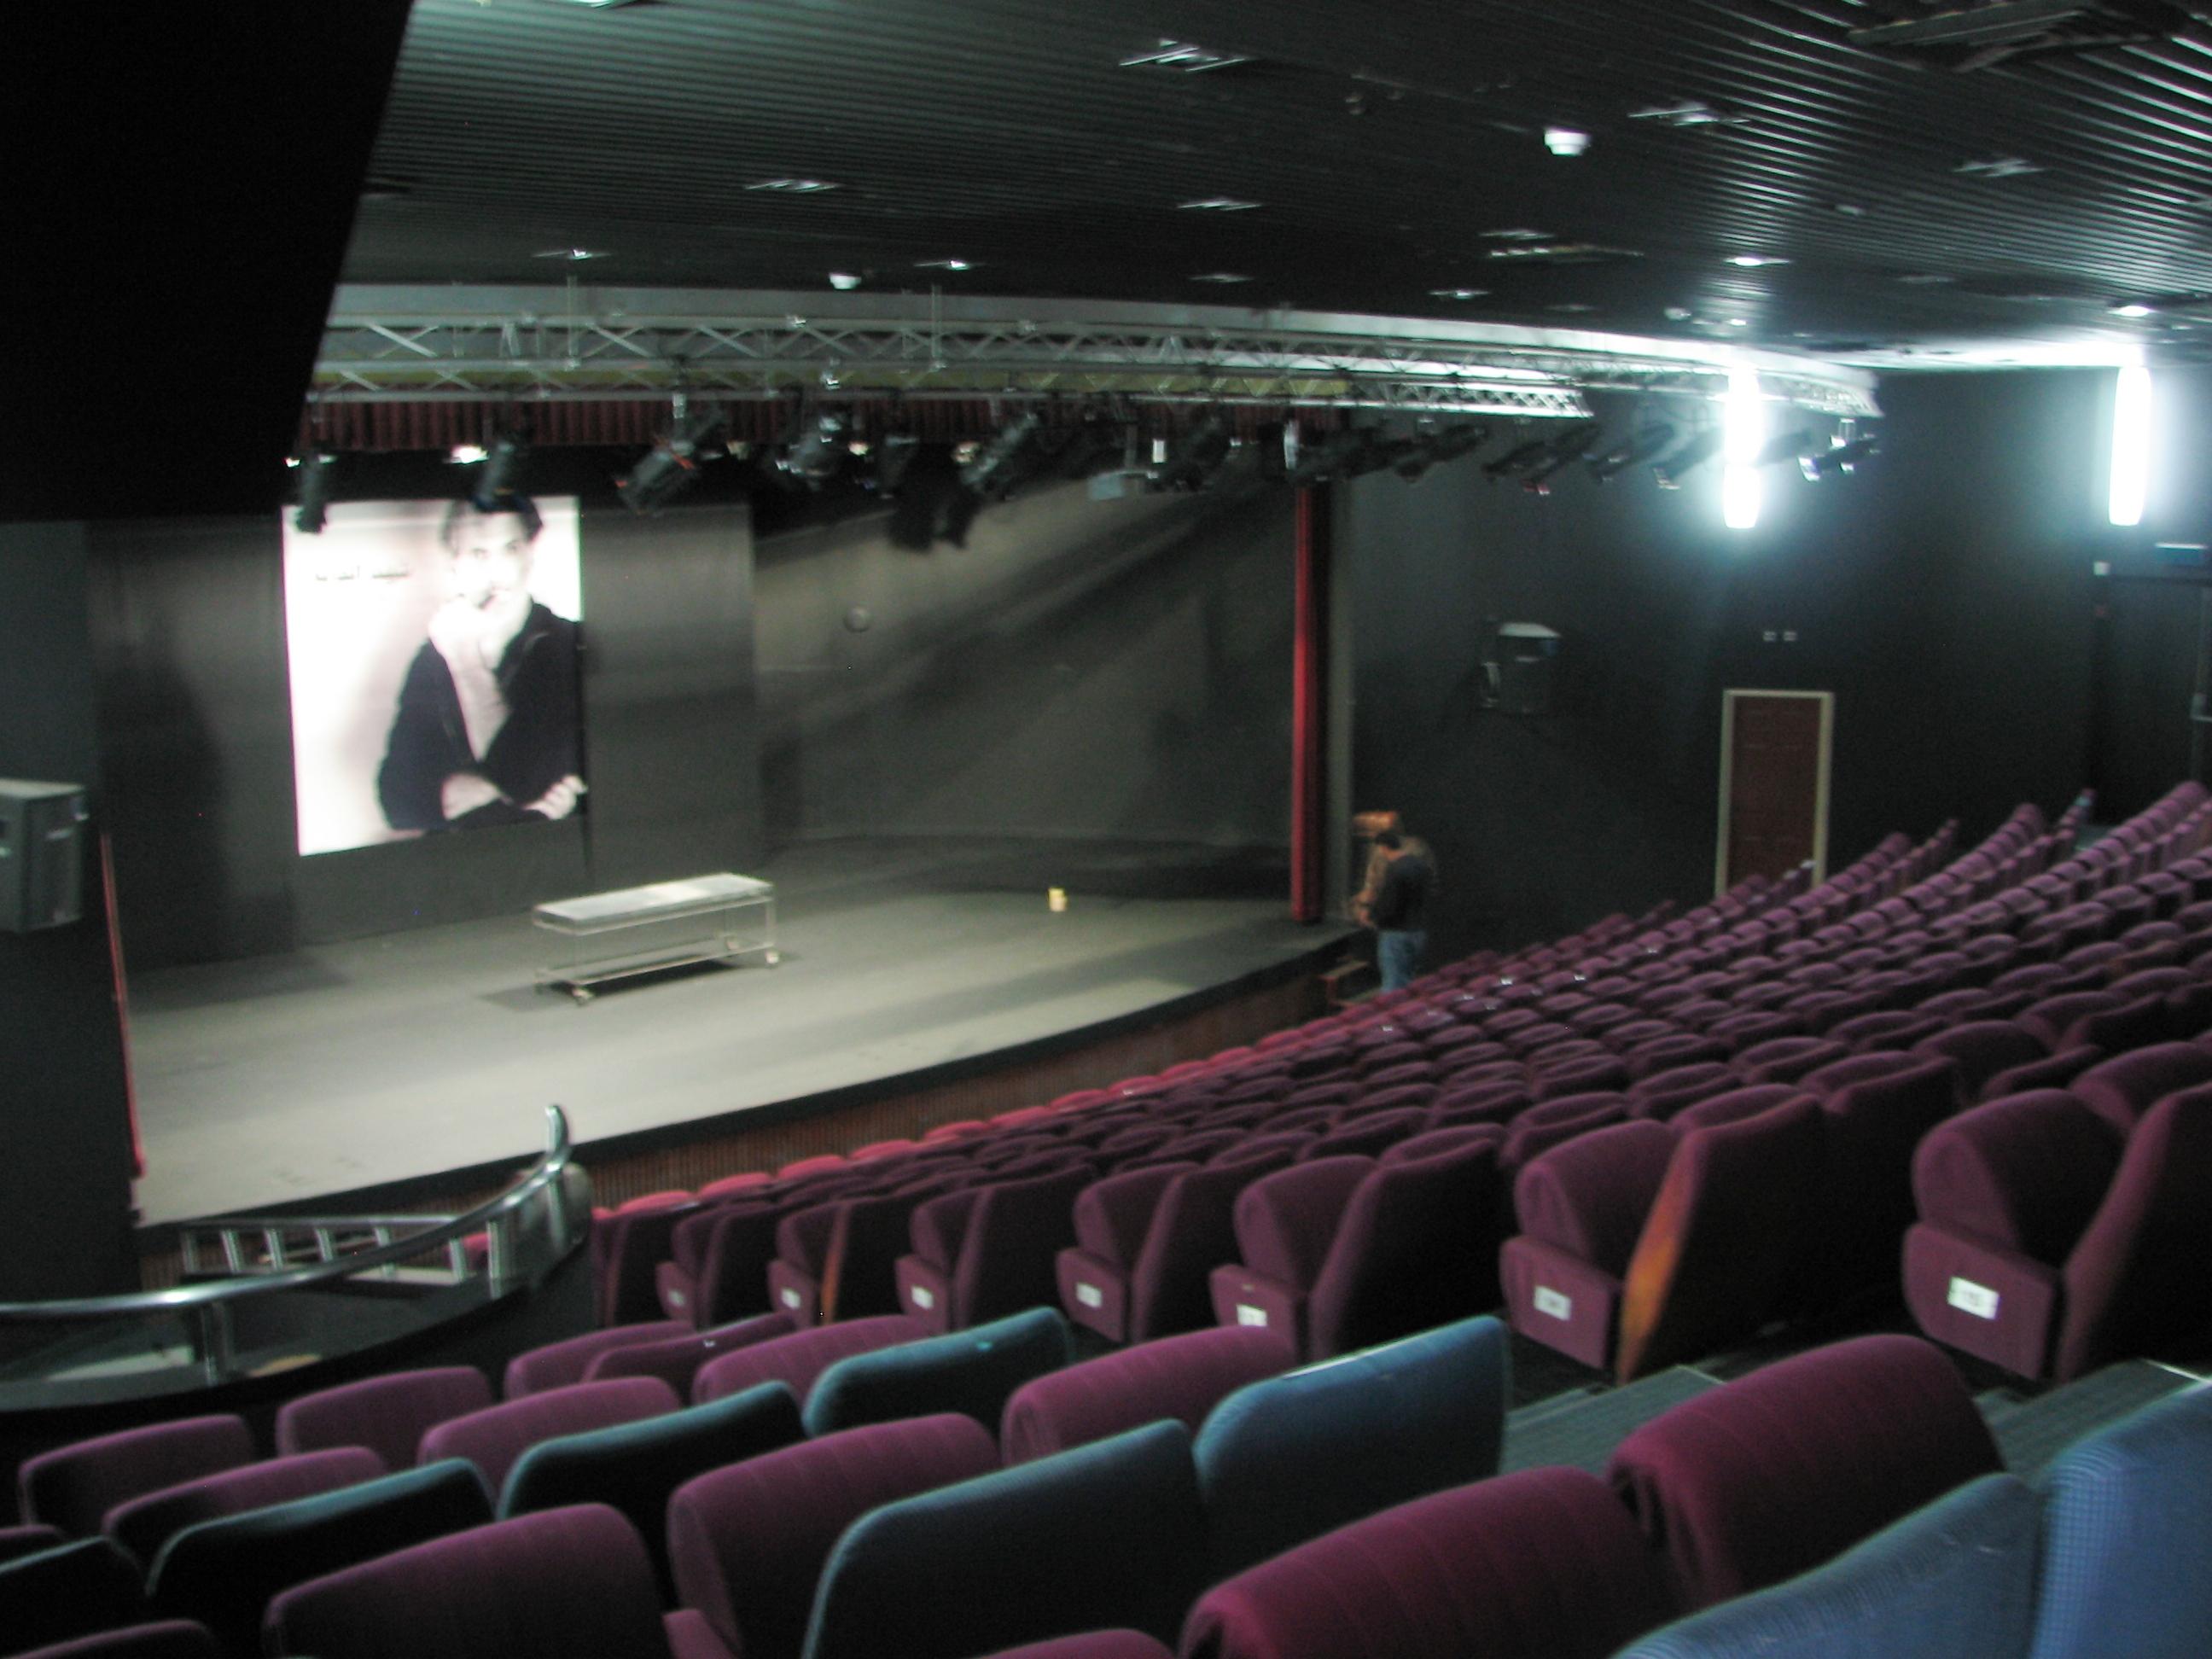 תיאטרון אל-מידאן – ויקיפדיה